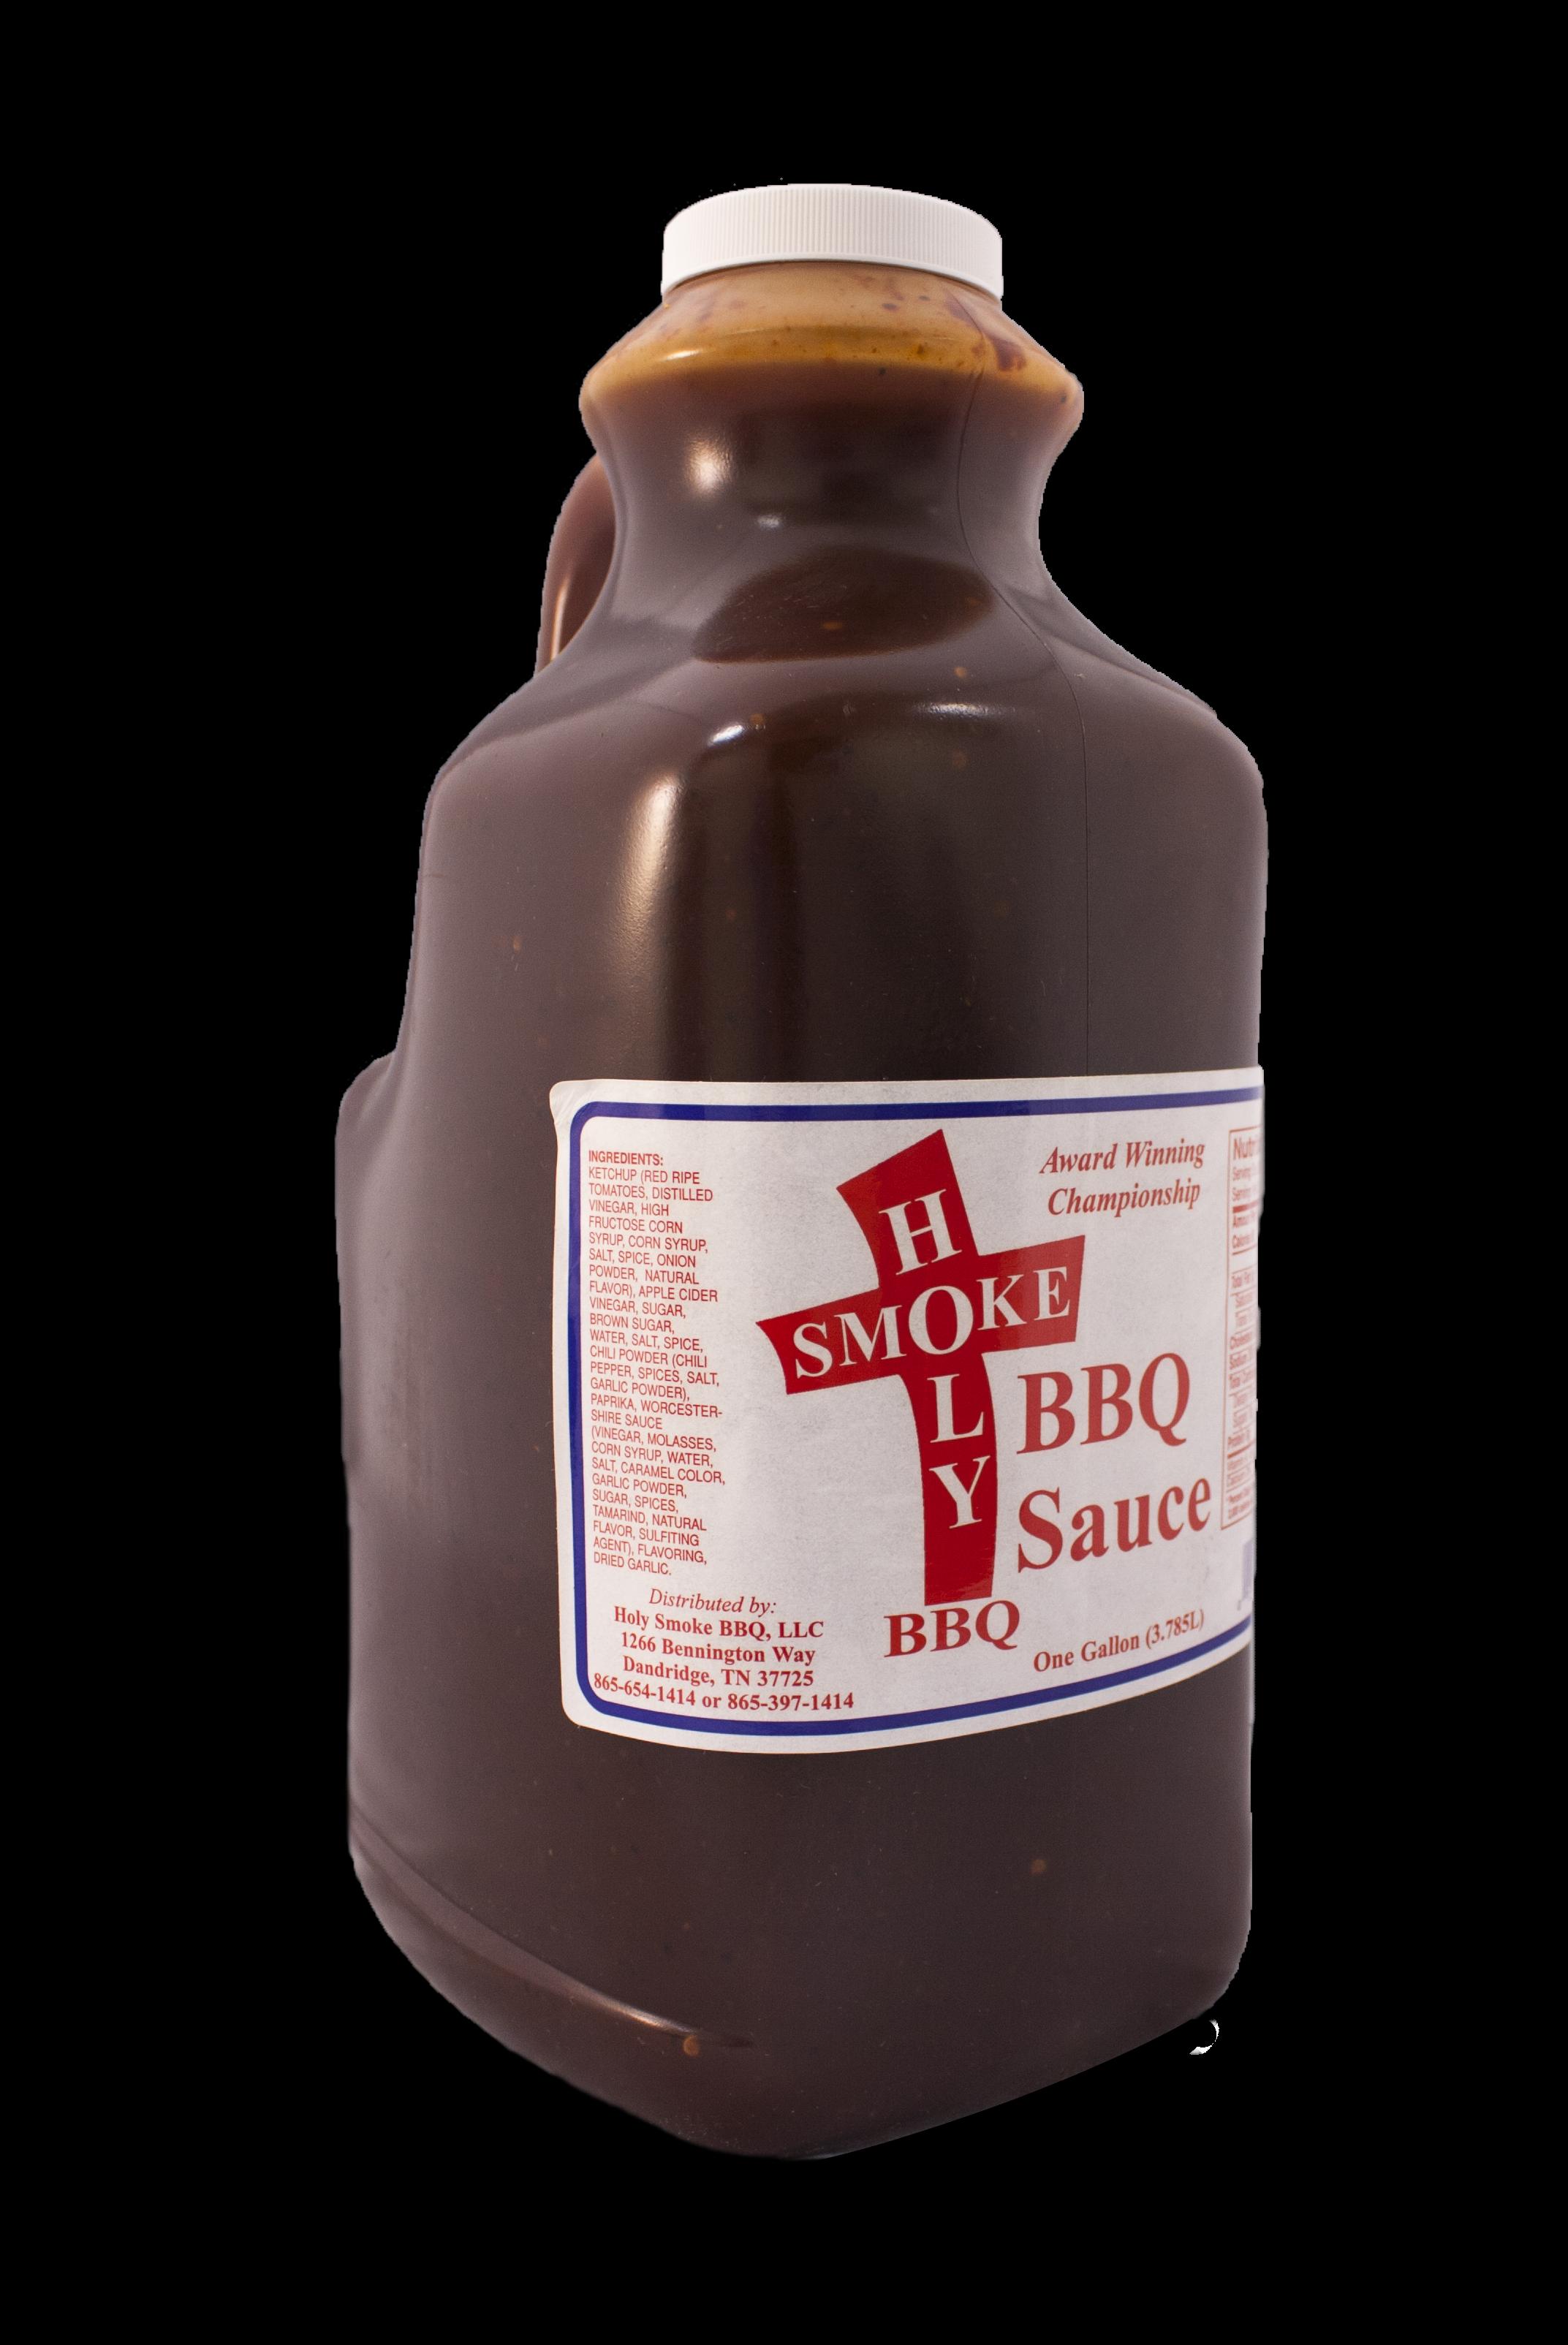 Holy Smokes-BBQ Sauce-1 gallon 0013964186512